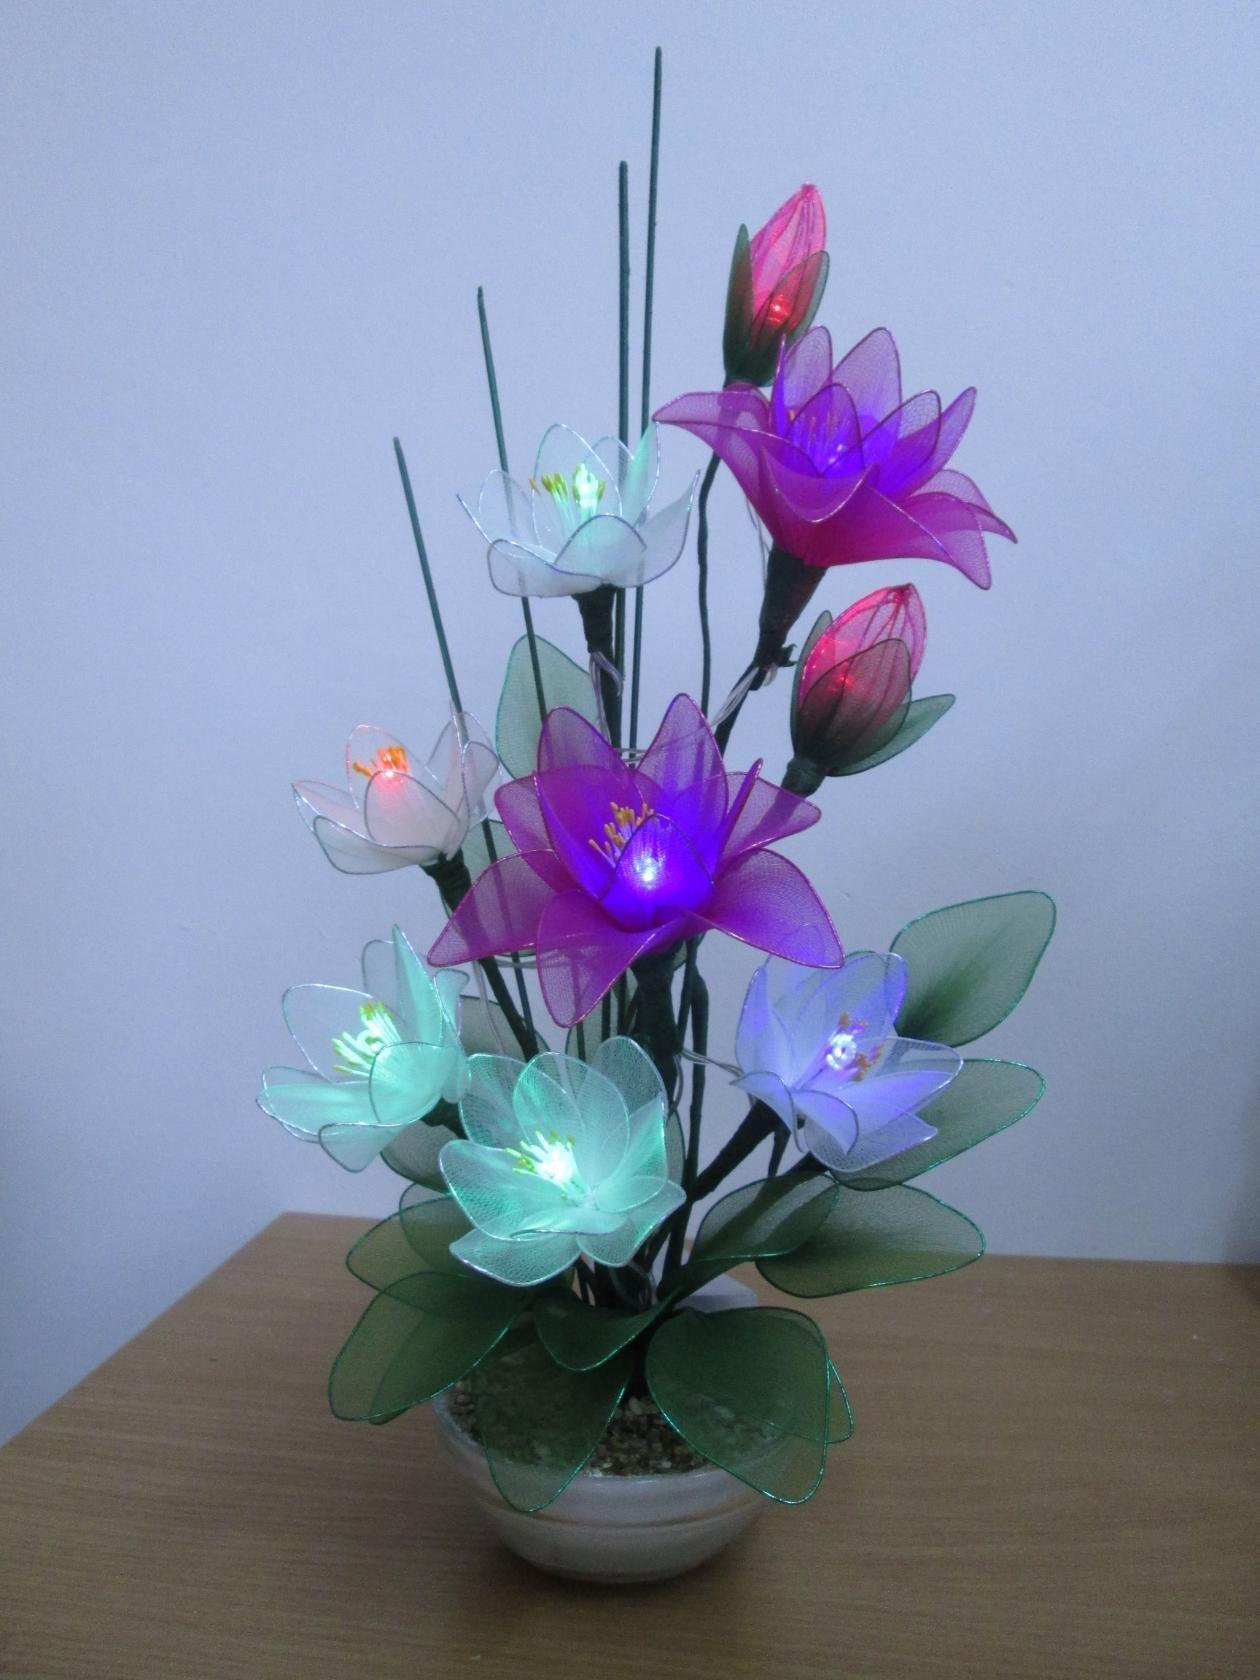 Nylon Flowers Satin Plastic Bottle Bottles Flower Making Handmade Creative Crafts Arrangements Craft Projects